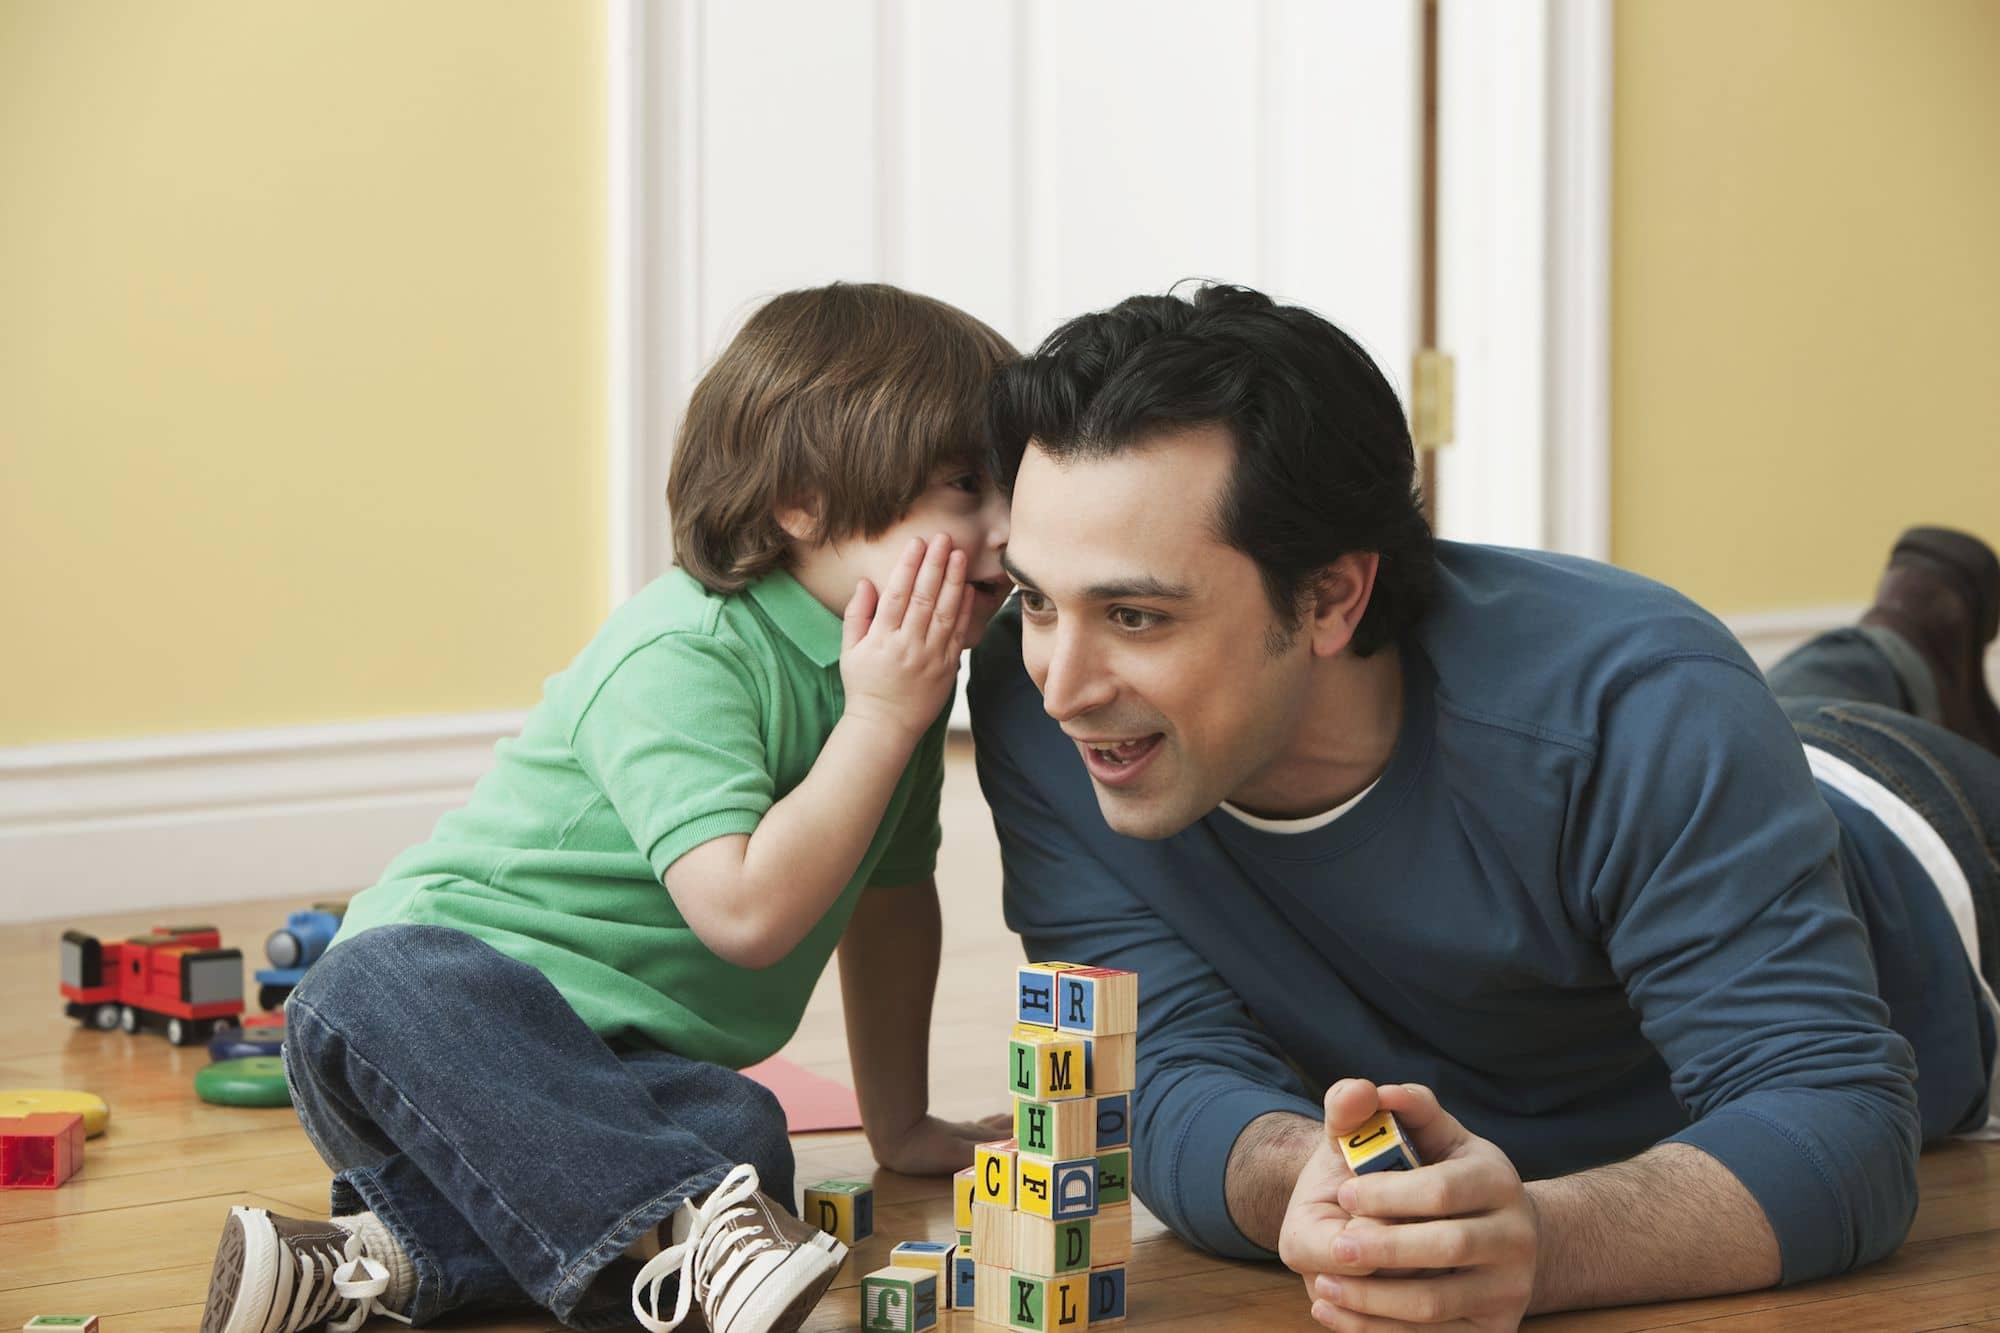 دهن لقی کودک